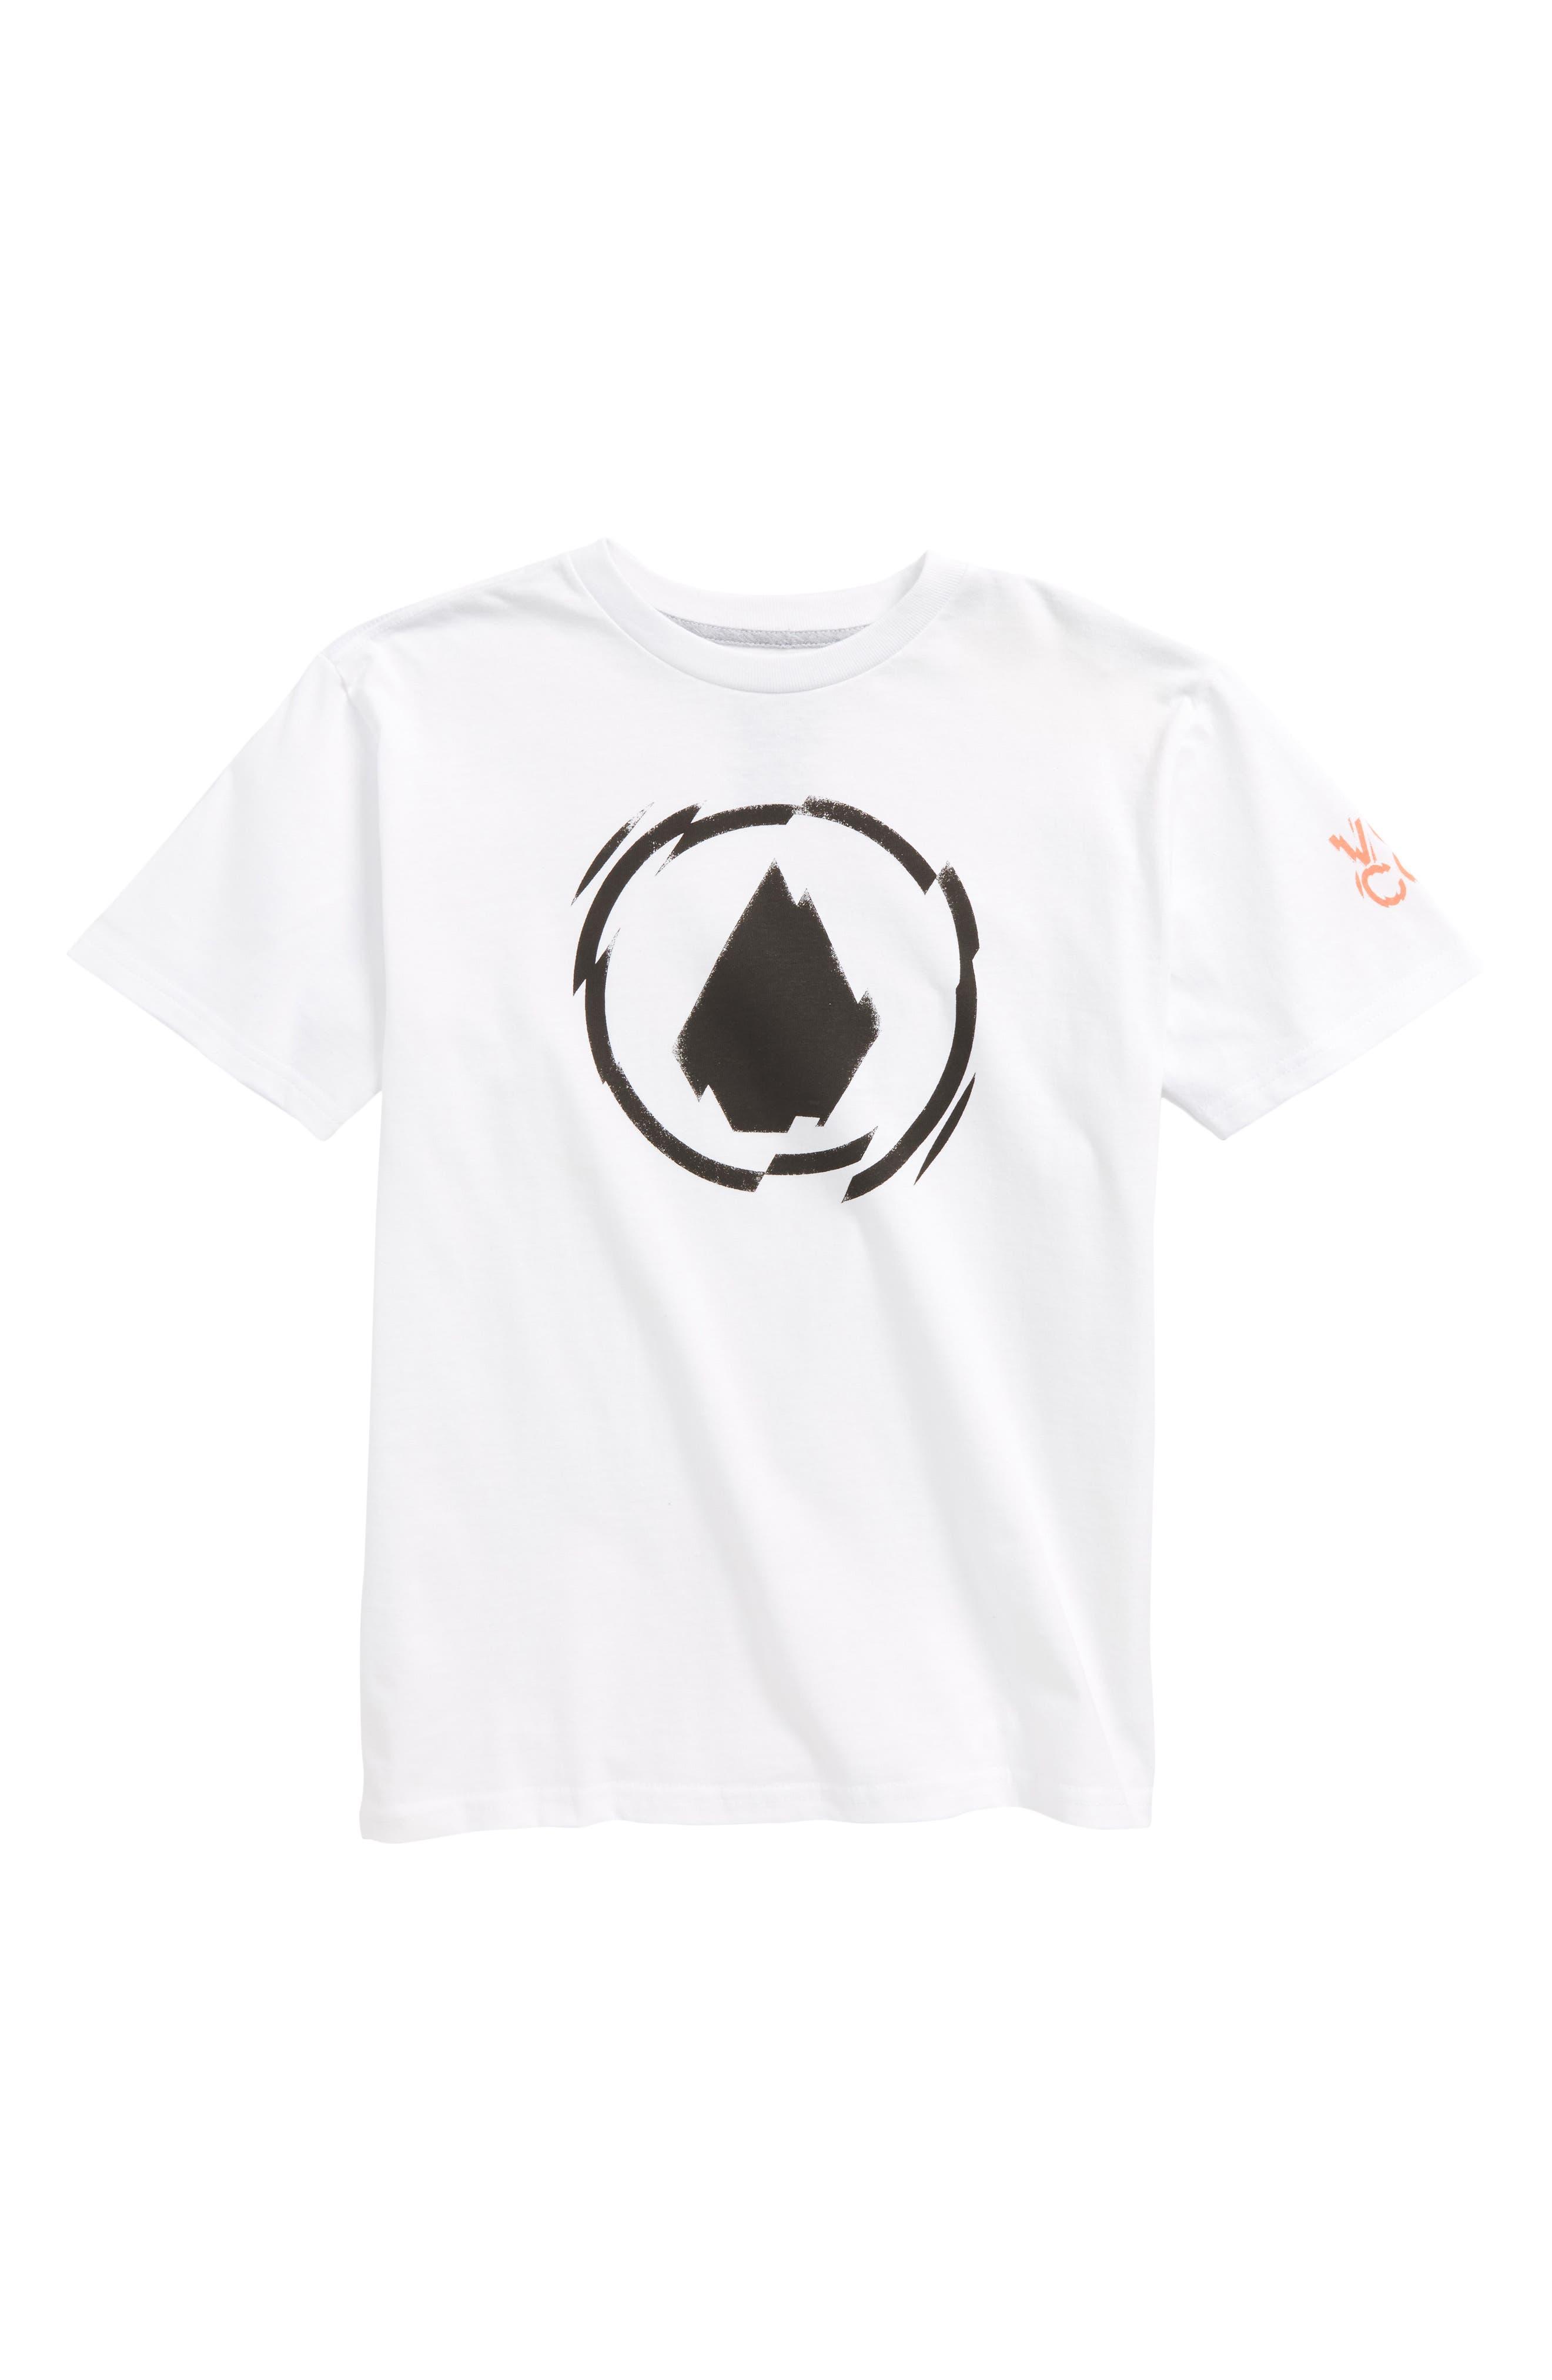 Shatter T-Shirt,                             Main thumbnail 1, color,                             100